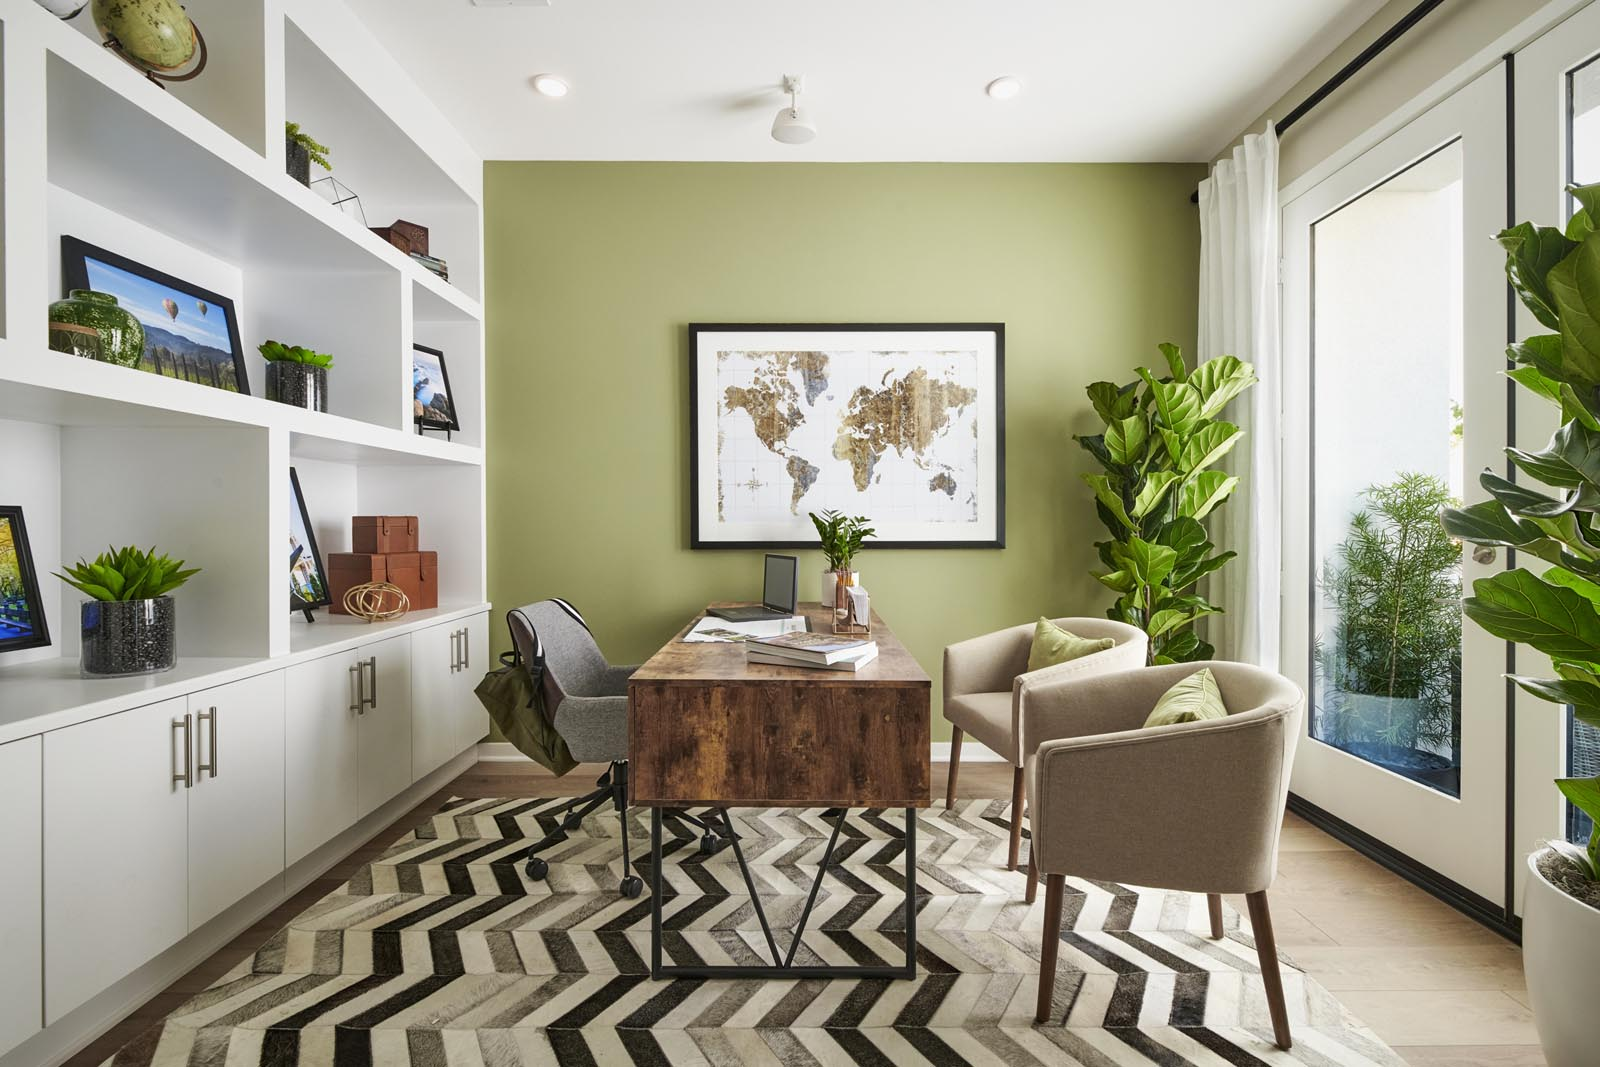 Den | Residence 3 | Enliven | New Homes in Rancho Cucamonga, CA | Van Daele Homes